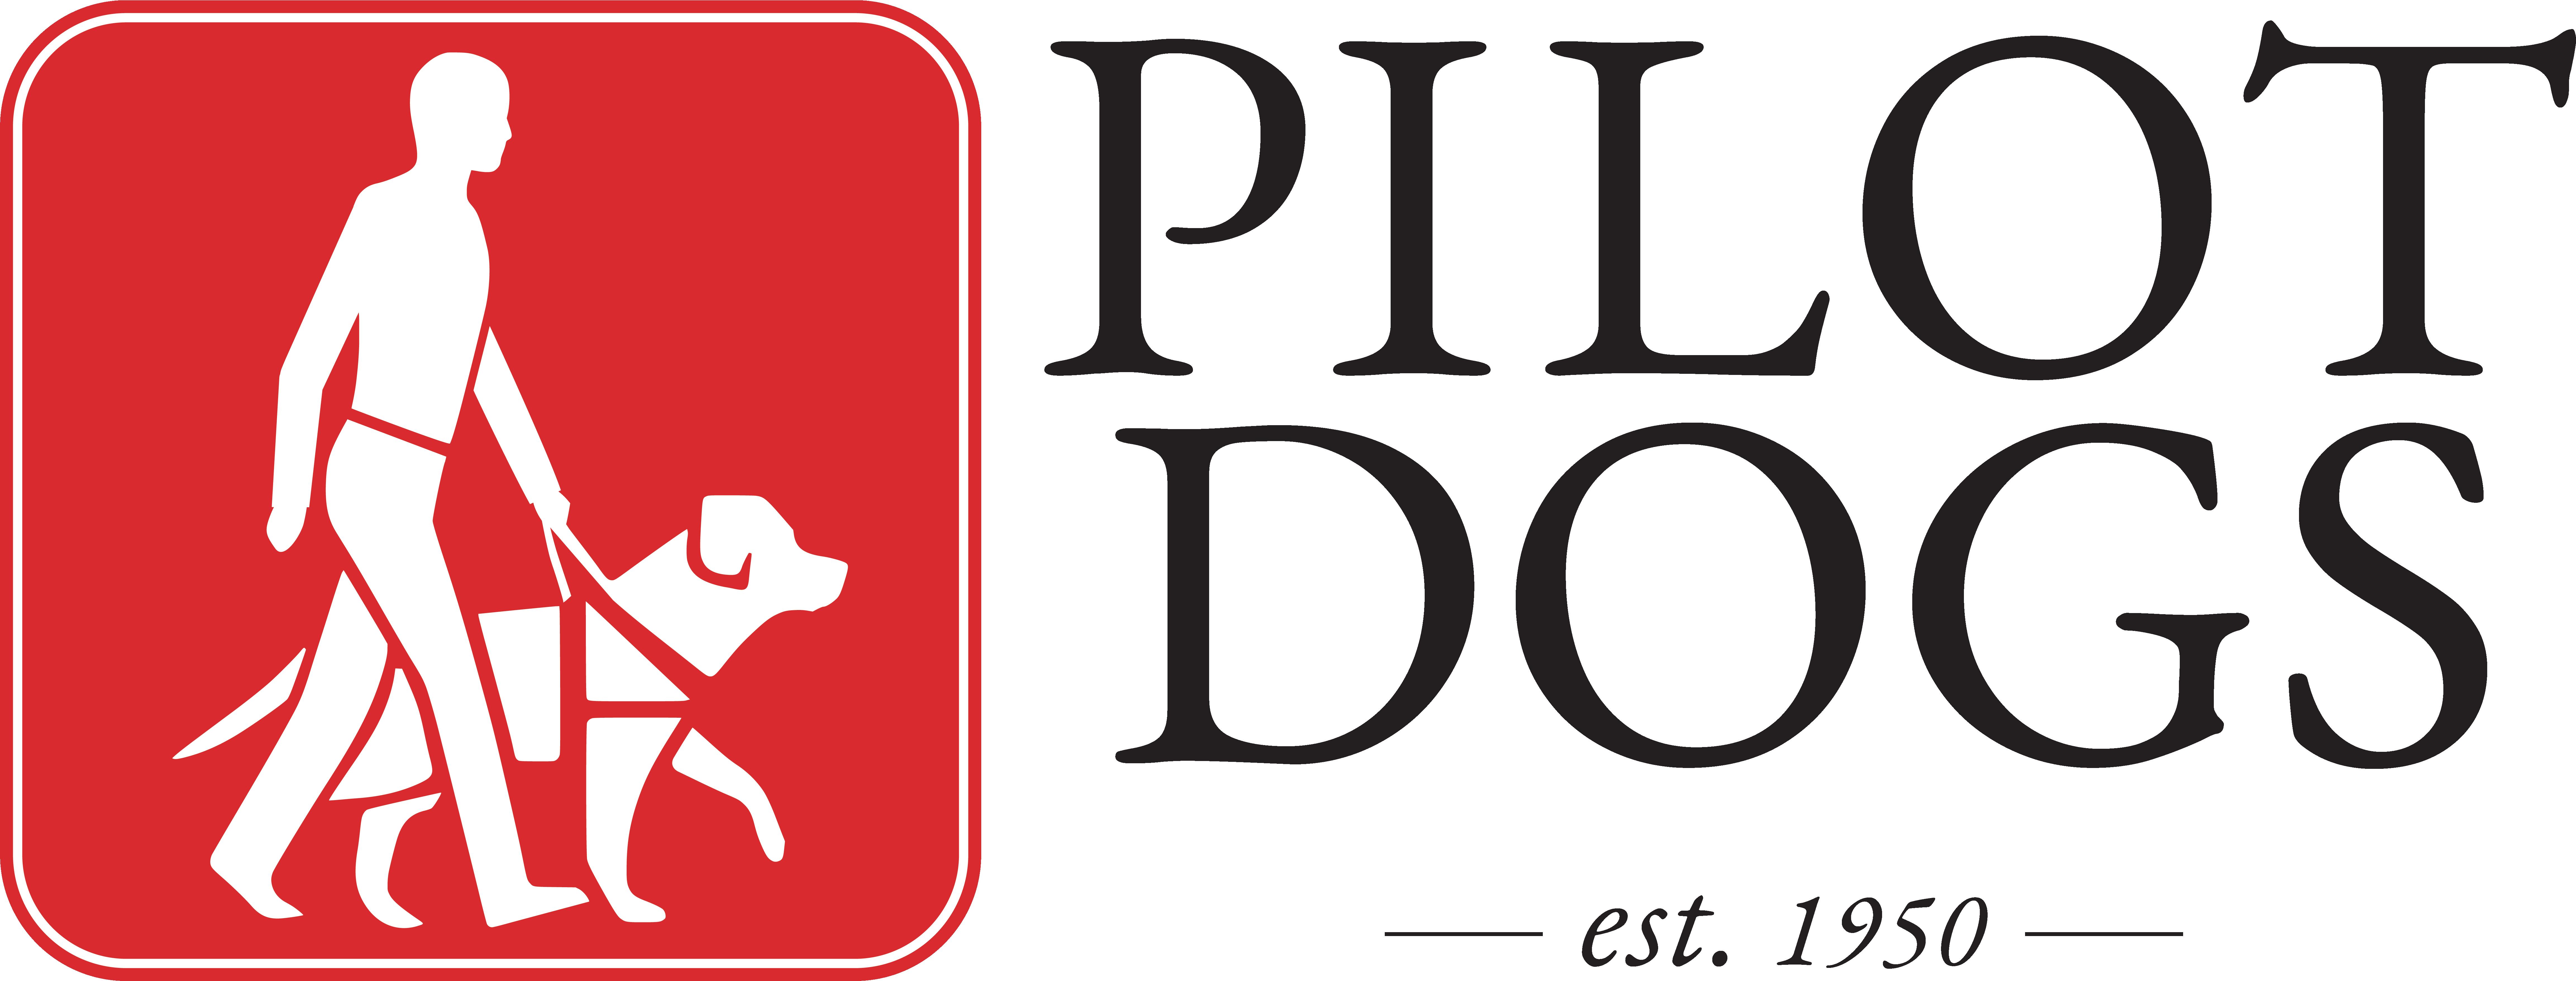 Pilot Dogs